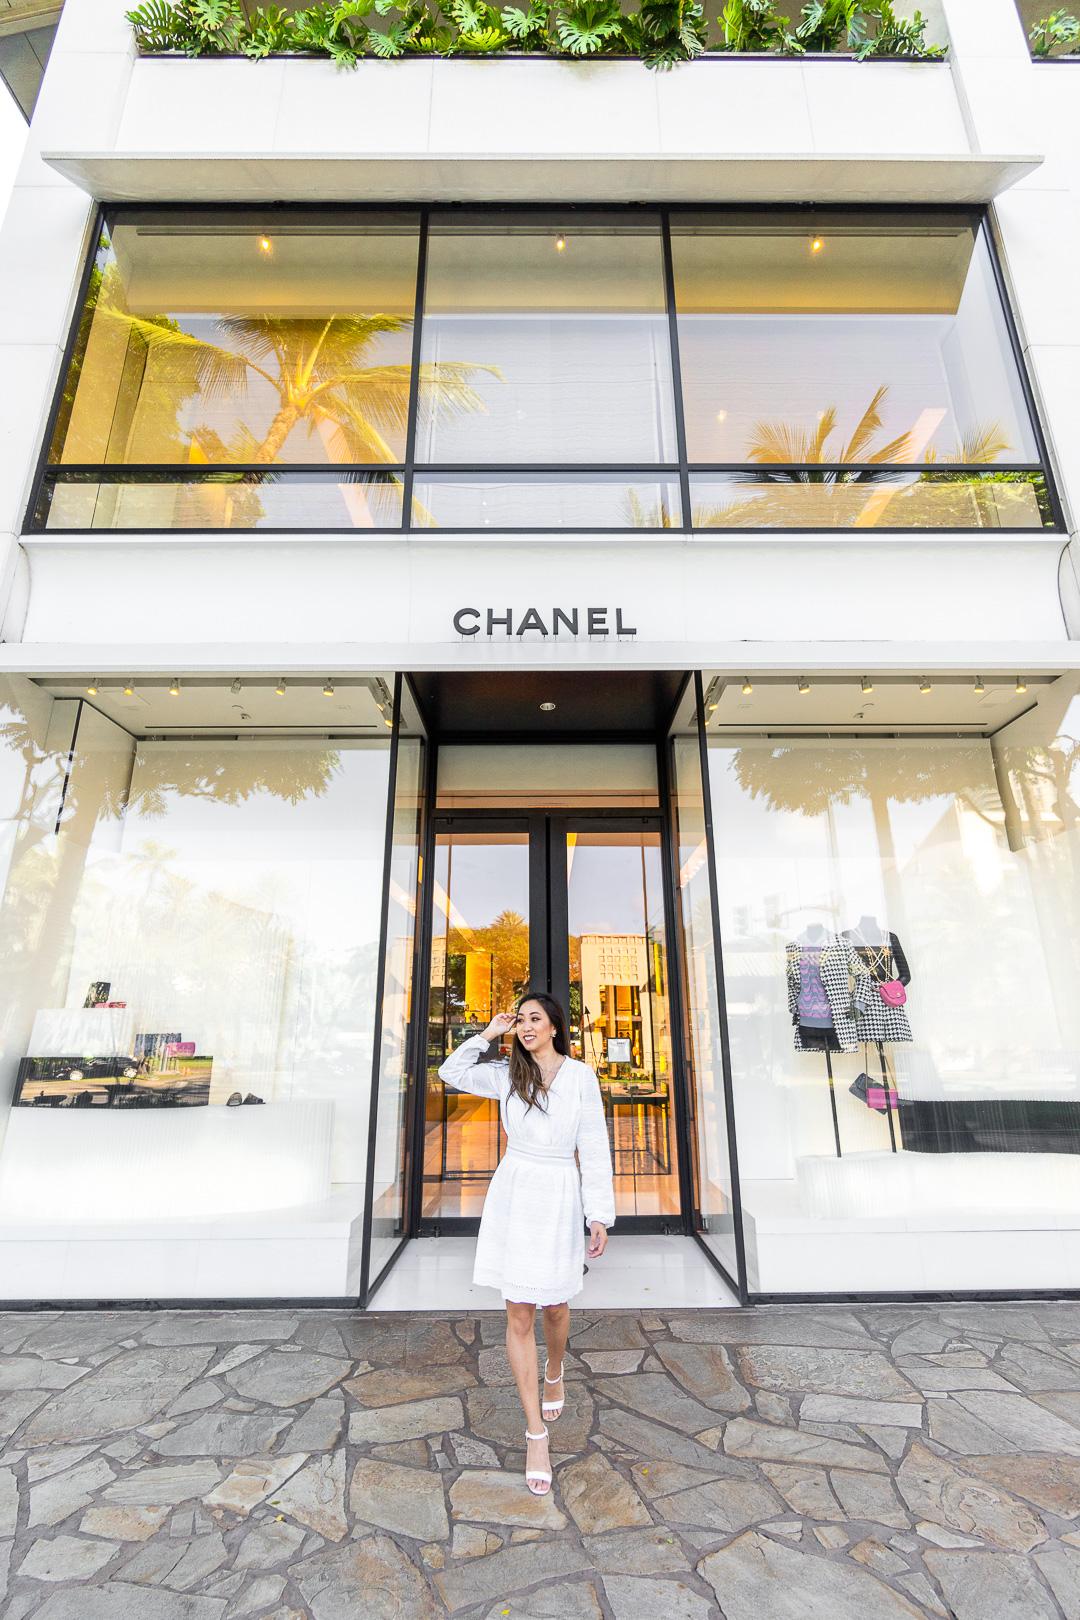 Chanel Hawaii Waikiki Store